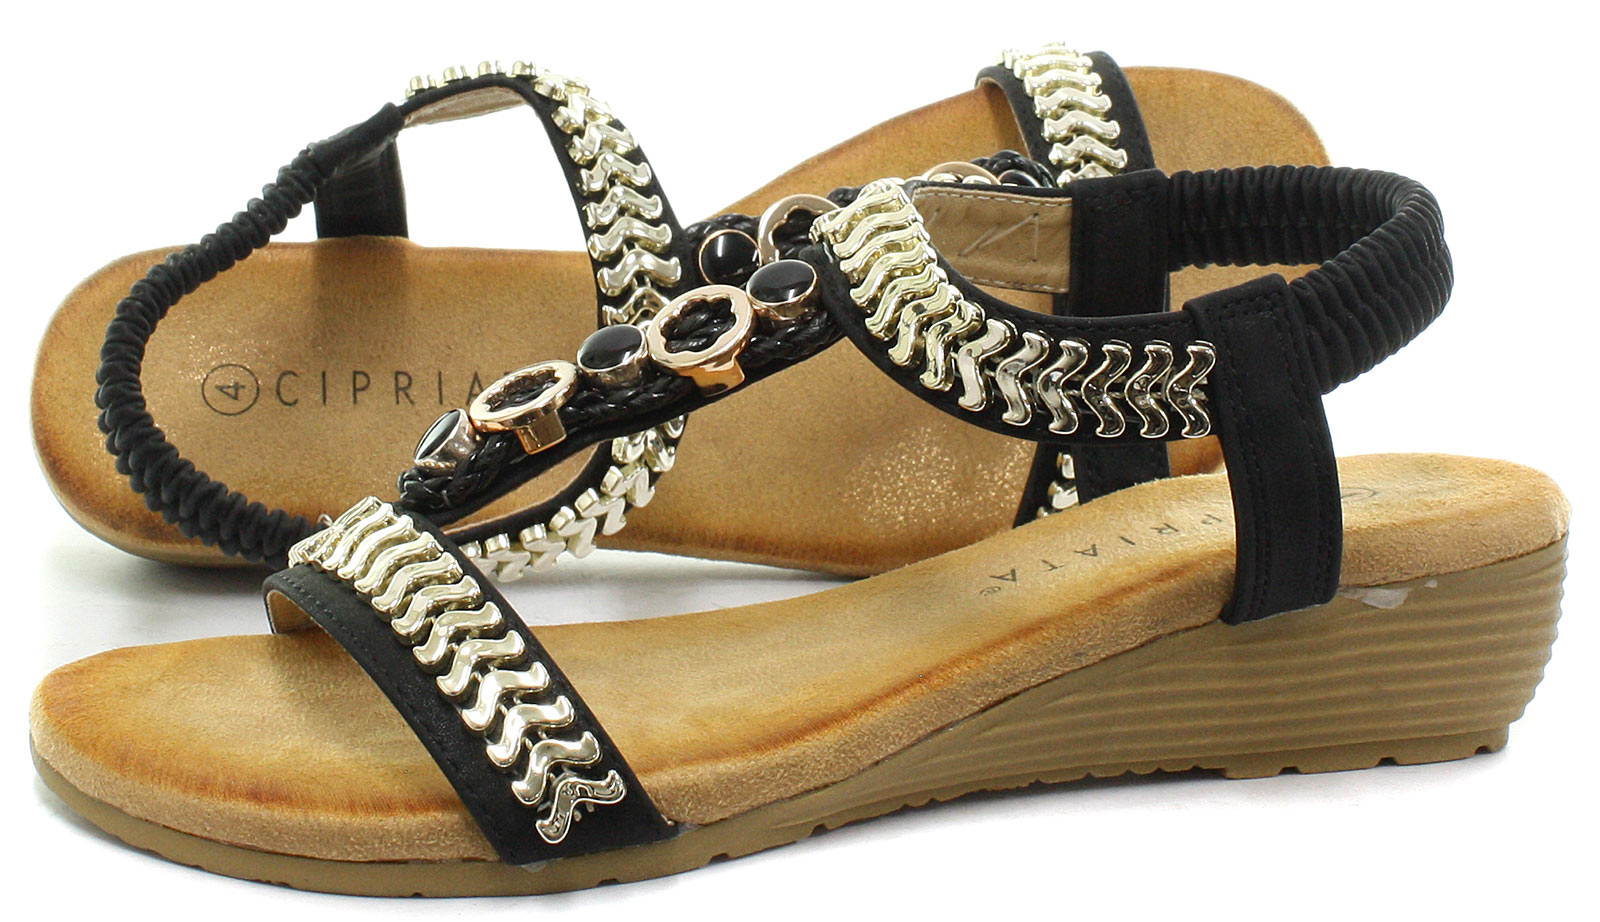 1dab78a6edff7 New Cipriata Camilla Black Womens Jewelled Sling Back Sandals ALL ...